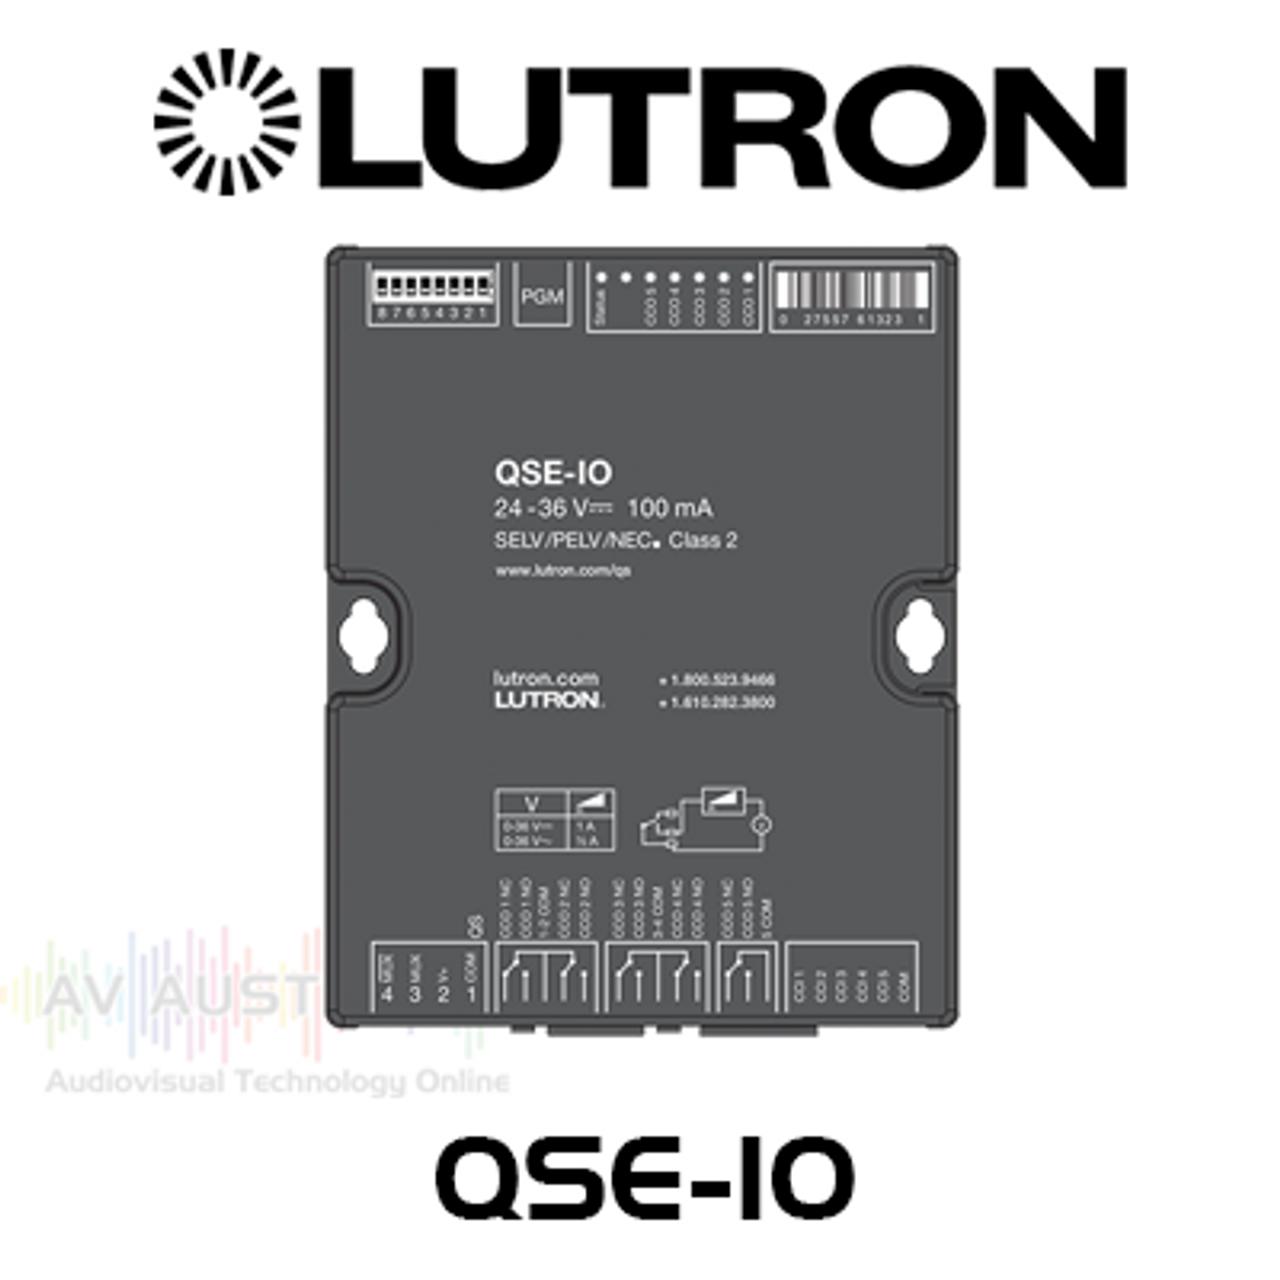 Lutron QS 5 Inputs 5 Outputs Contact Closure Interface